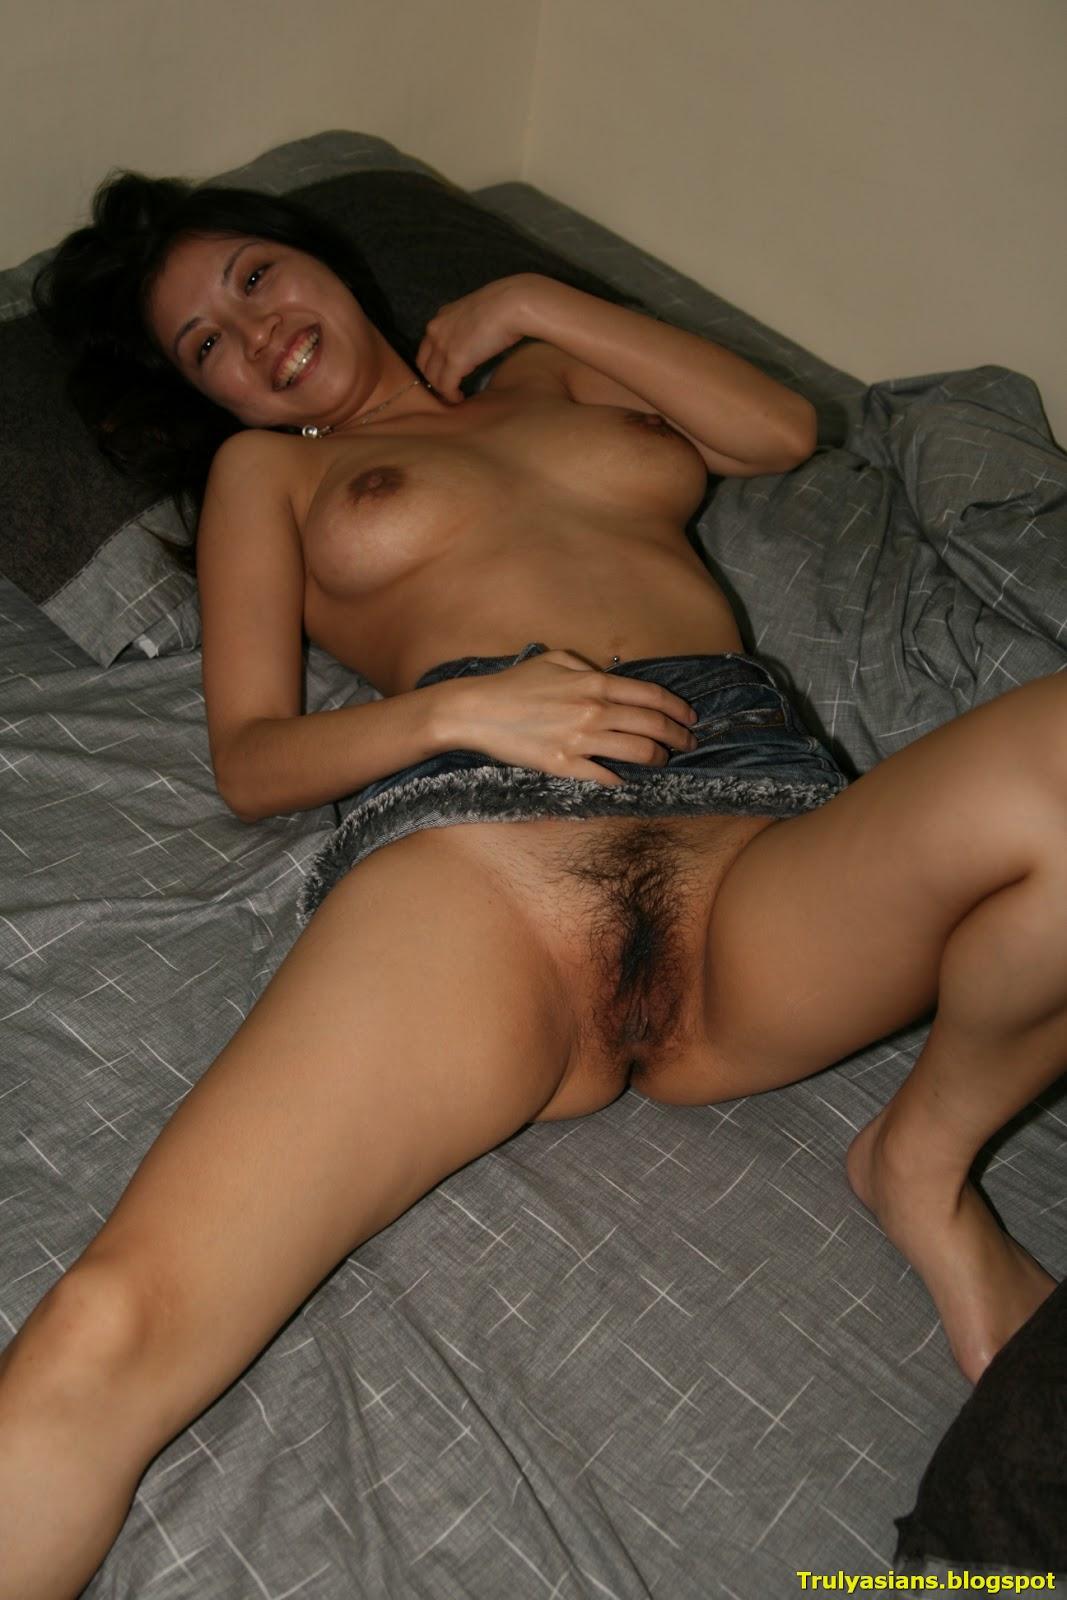 bakersfield-girls-nude-pics-virgin-vagina-anatomy